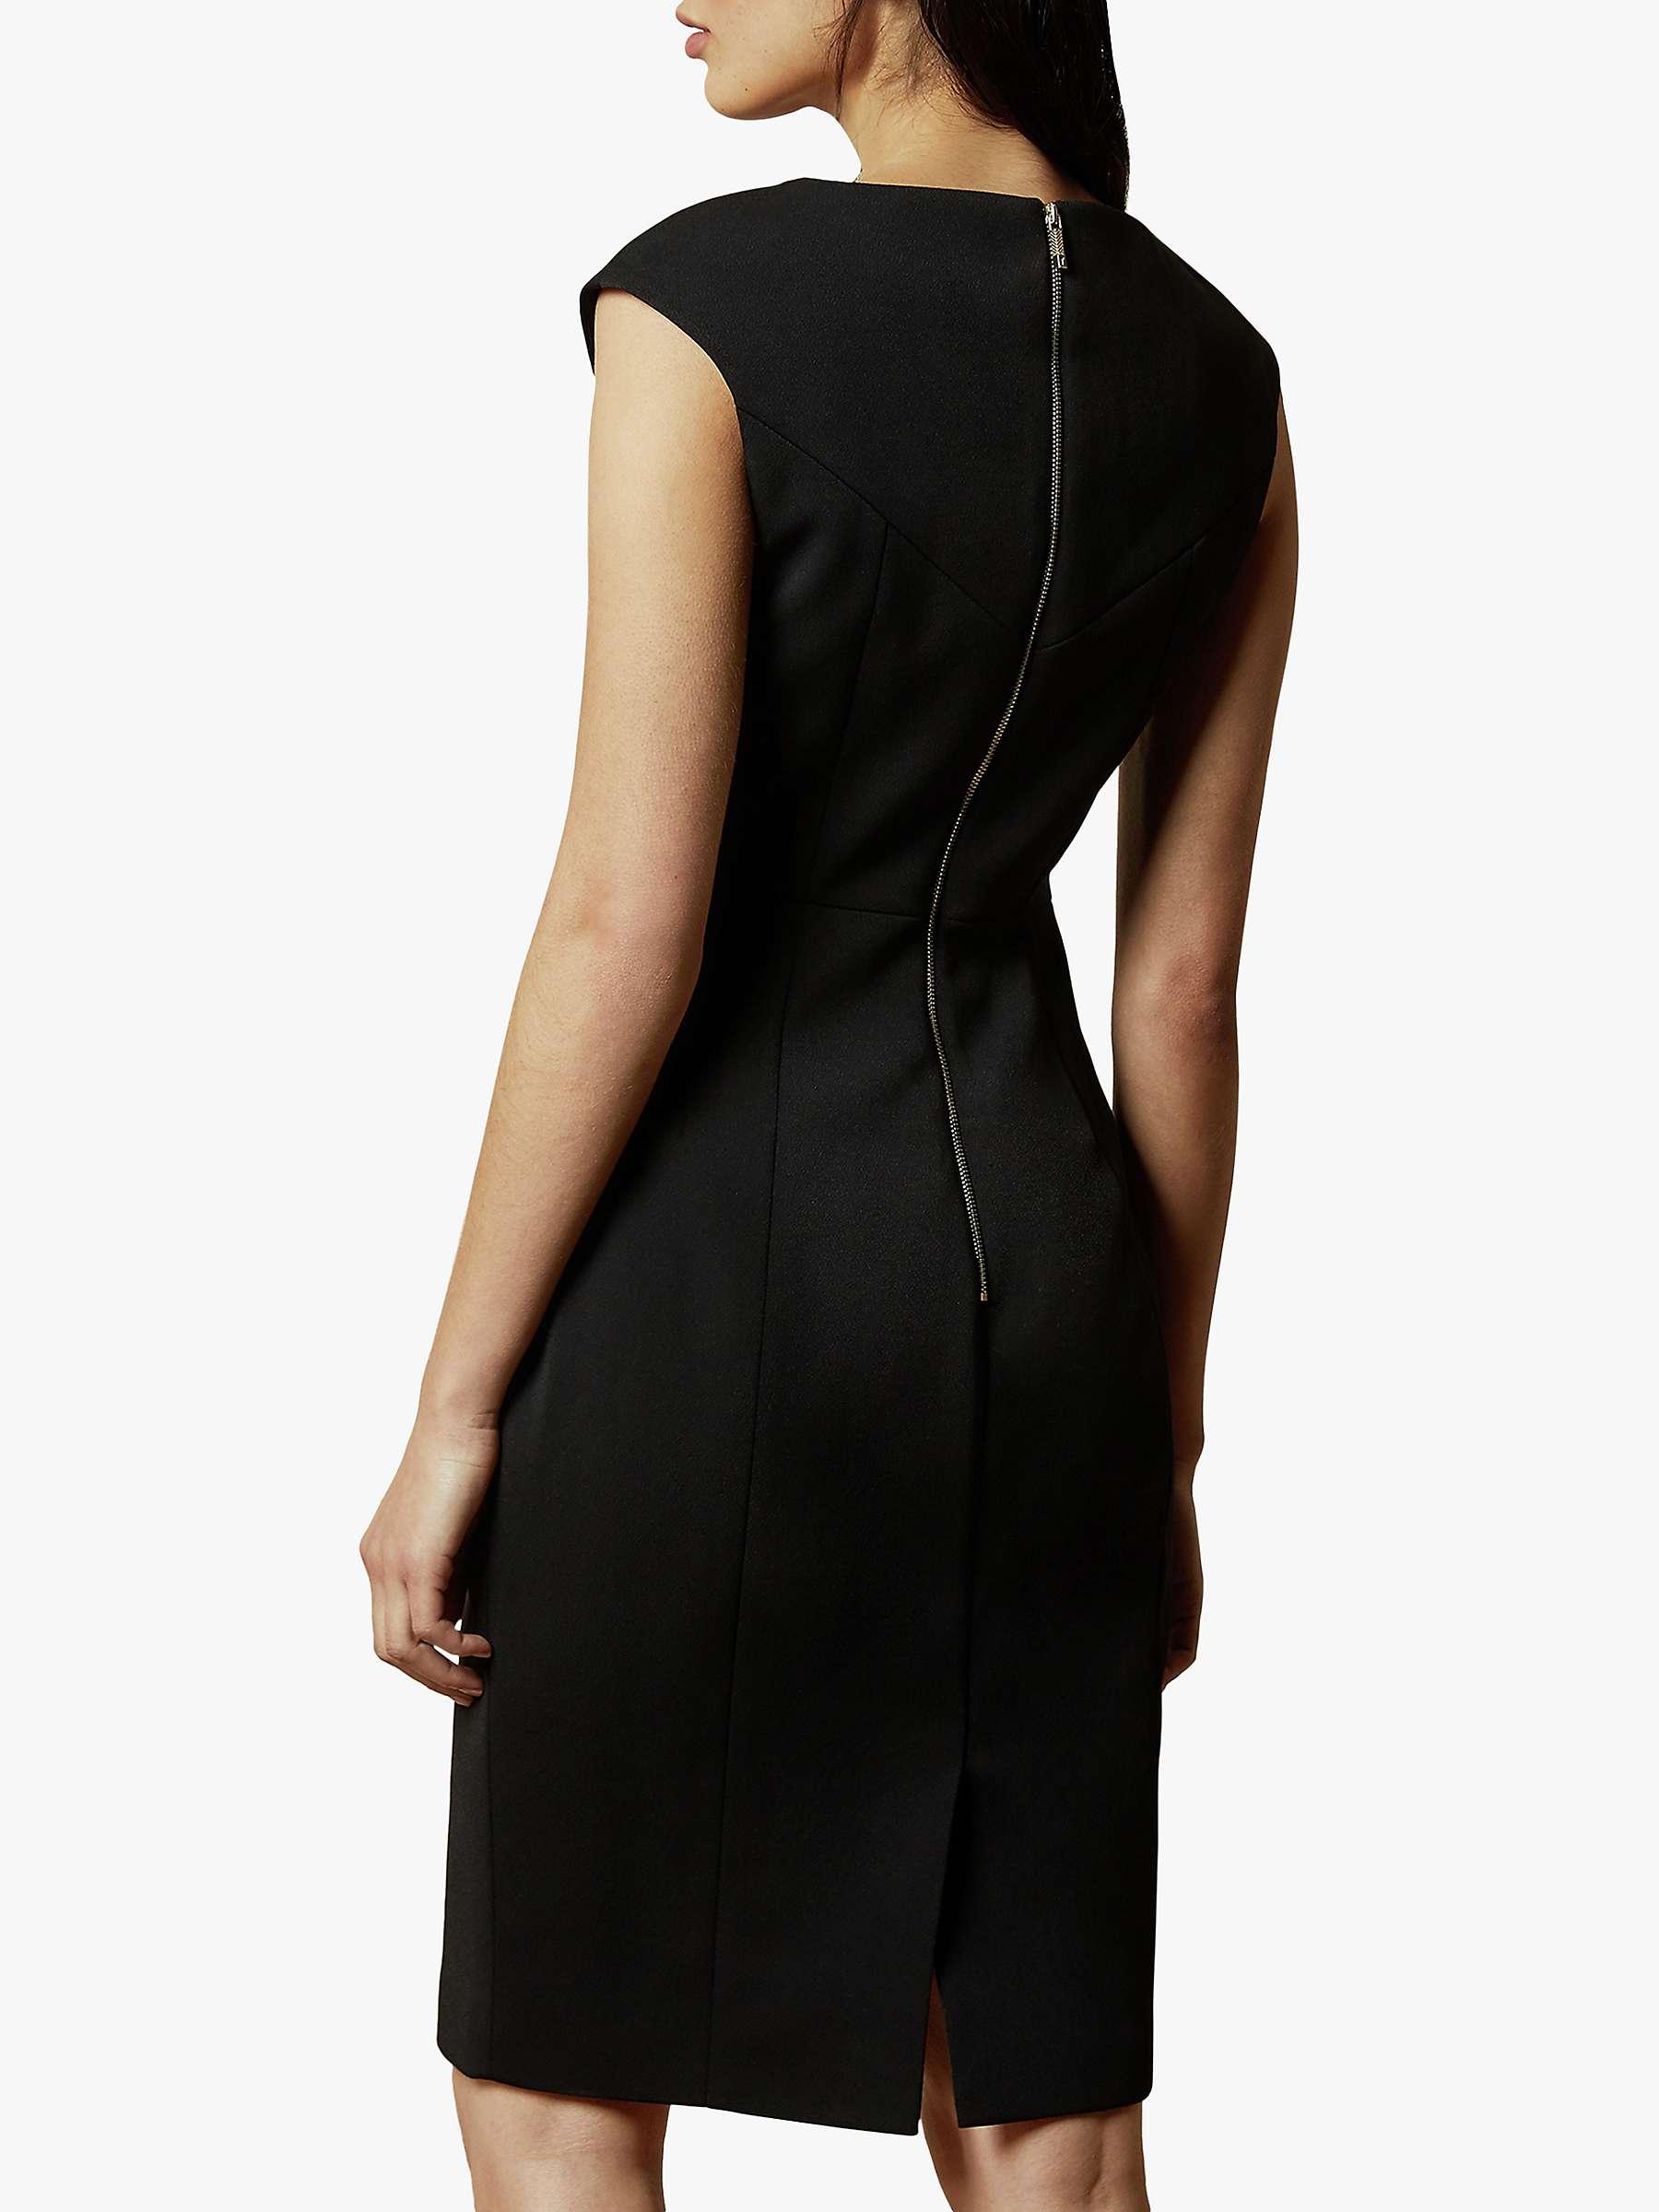 Ted Baker Pelagai Boat Neck Midi Dress, Black